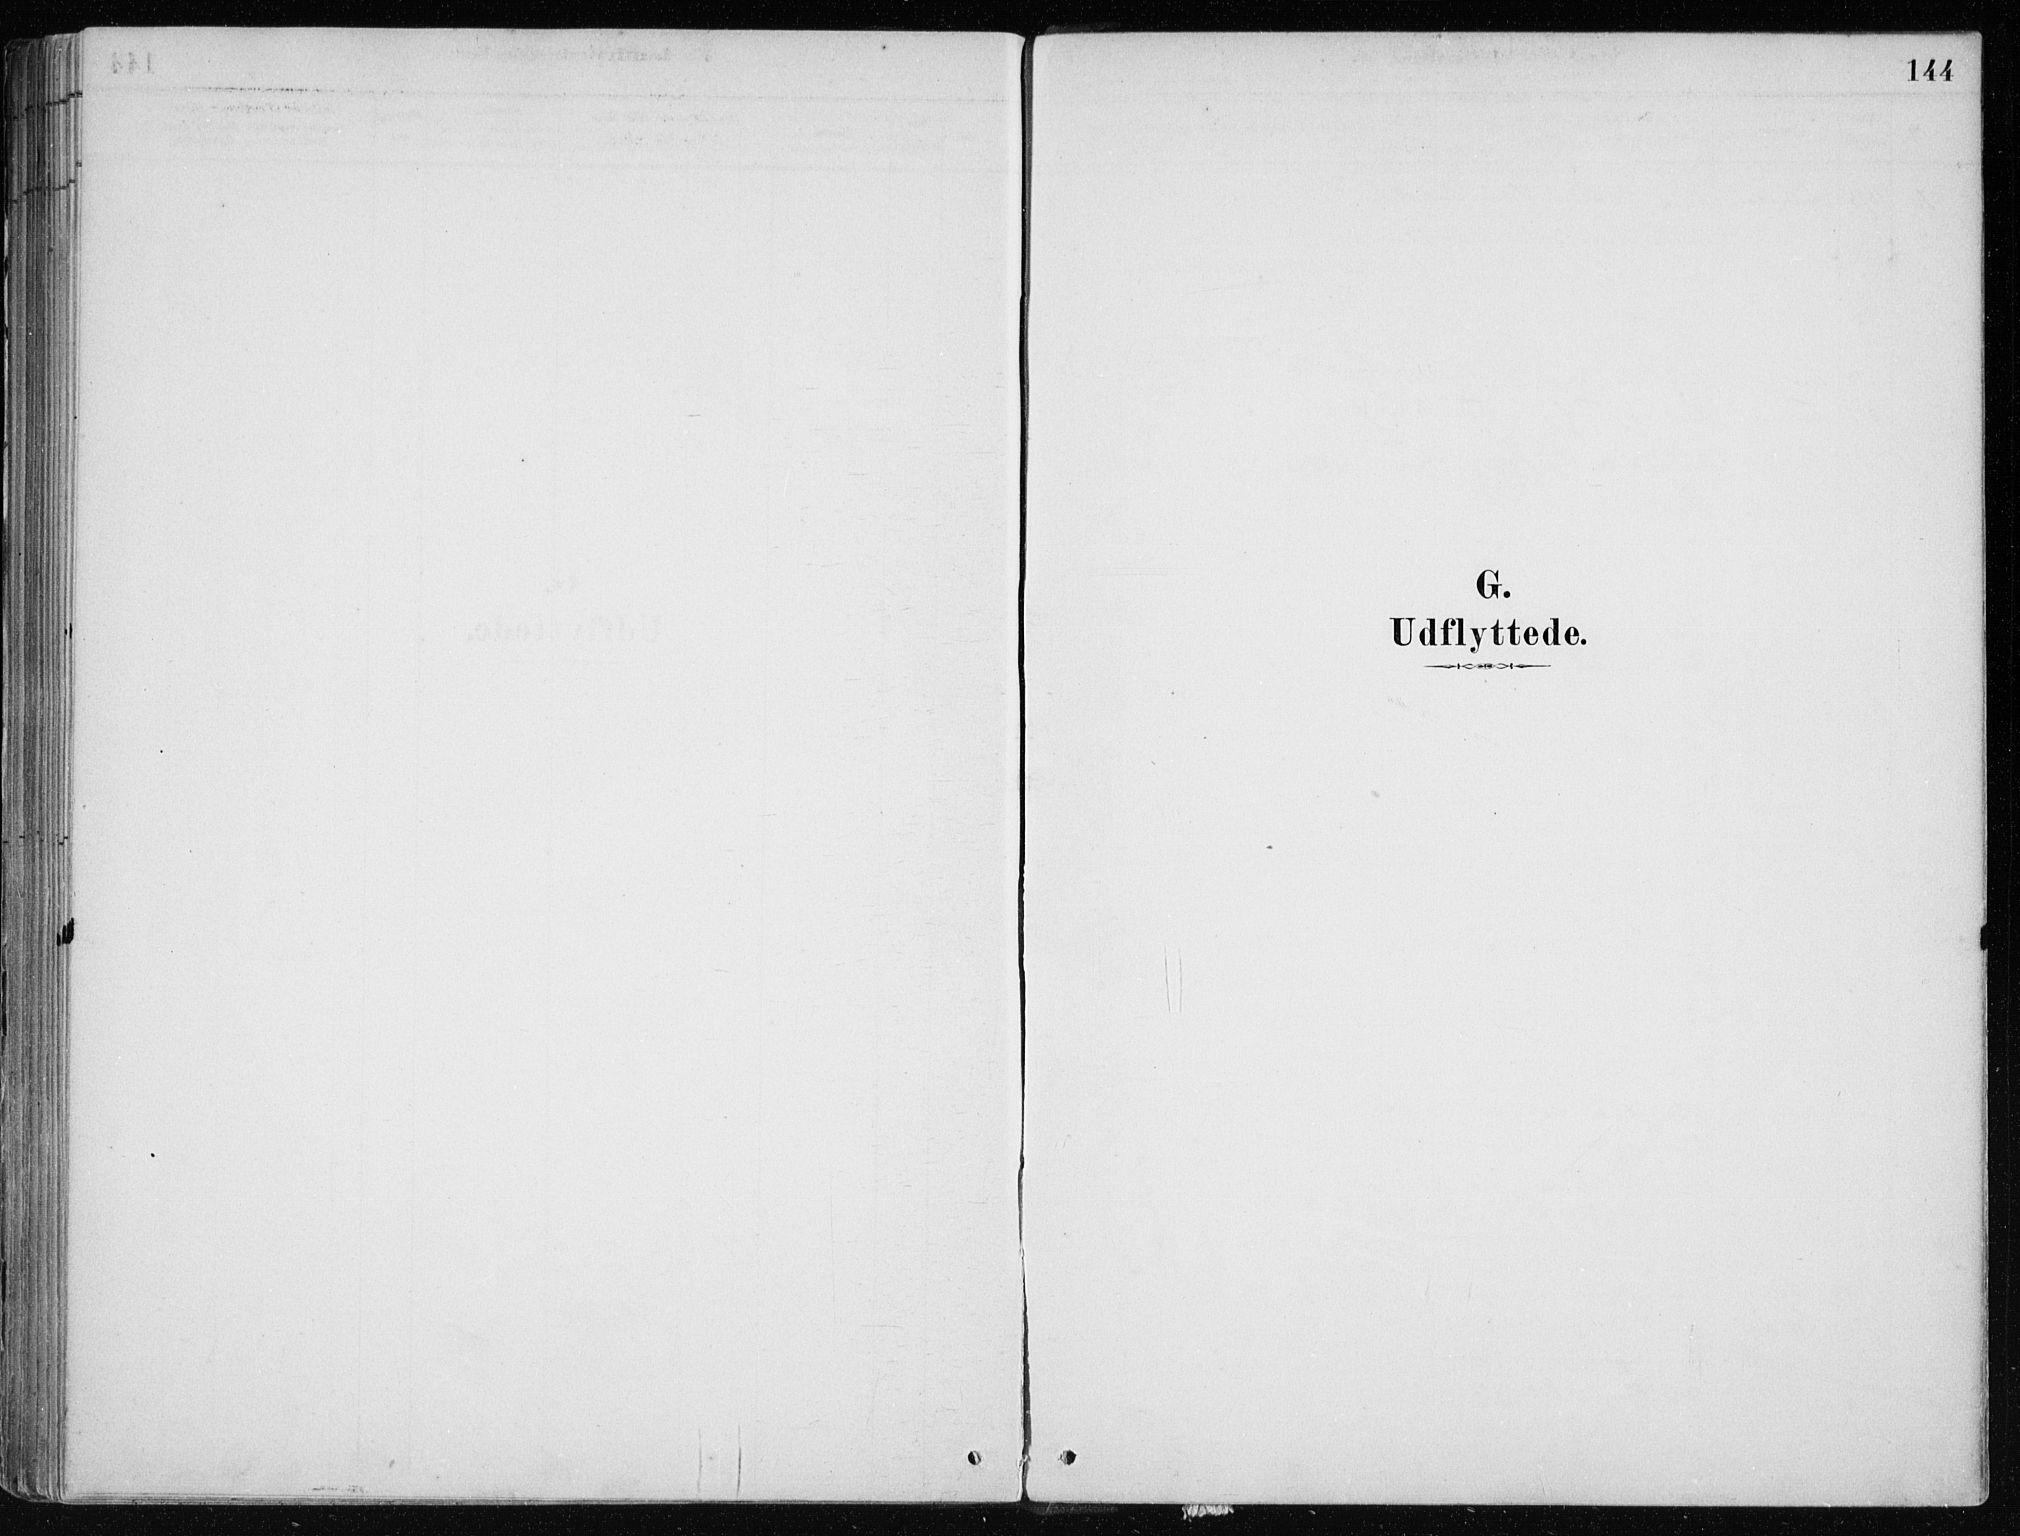 SAB, Sogndal Sokneprestembete, H/Haa/Haac/L0001: Ministerialbok nr. C 1, 1878-1907, s. 144